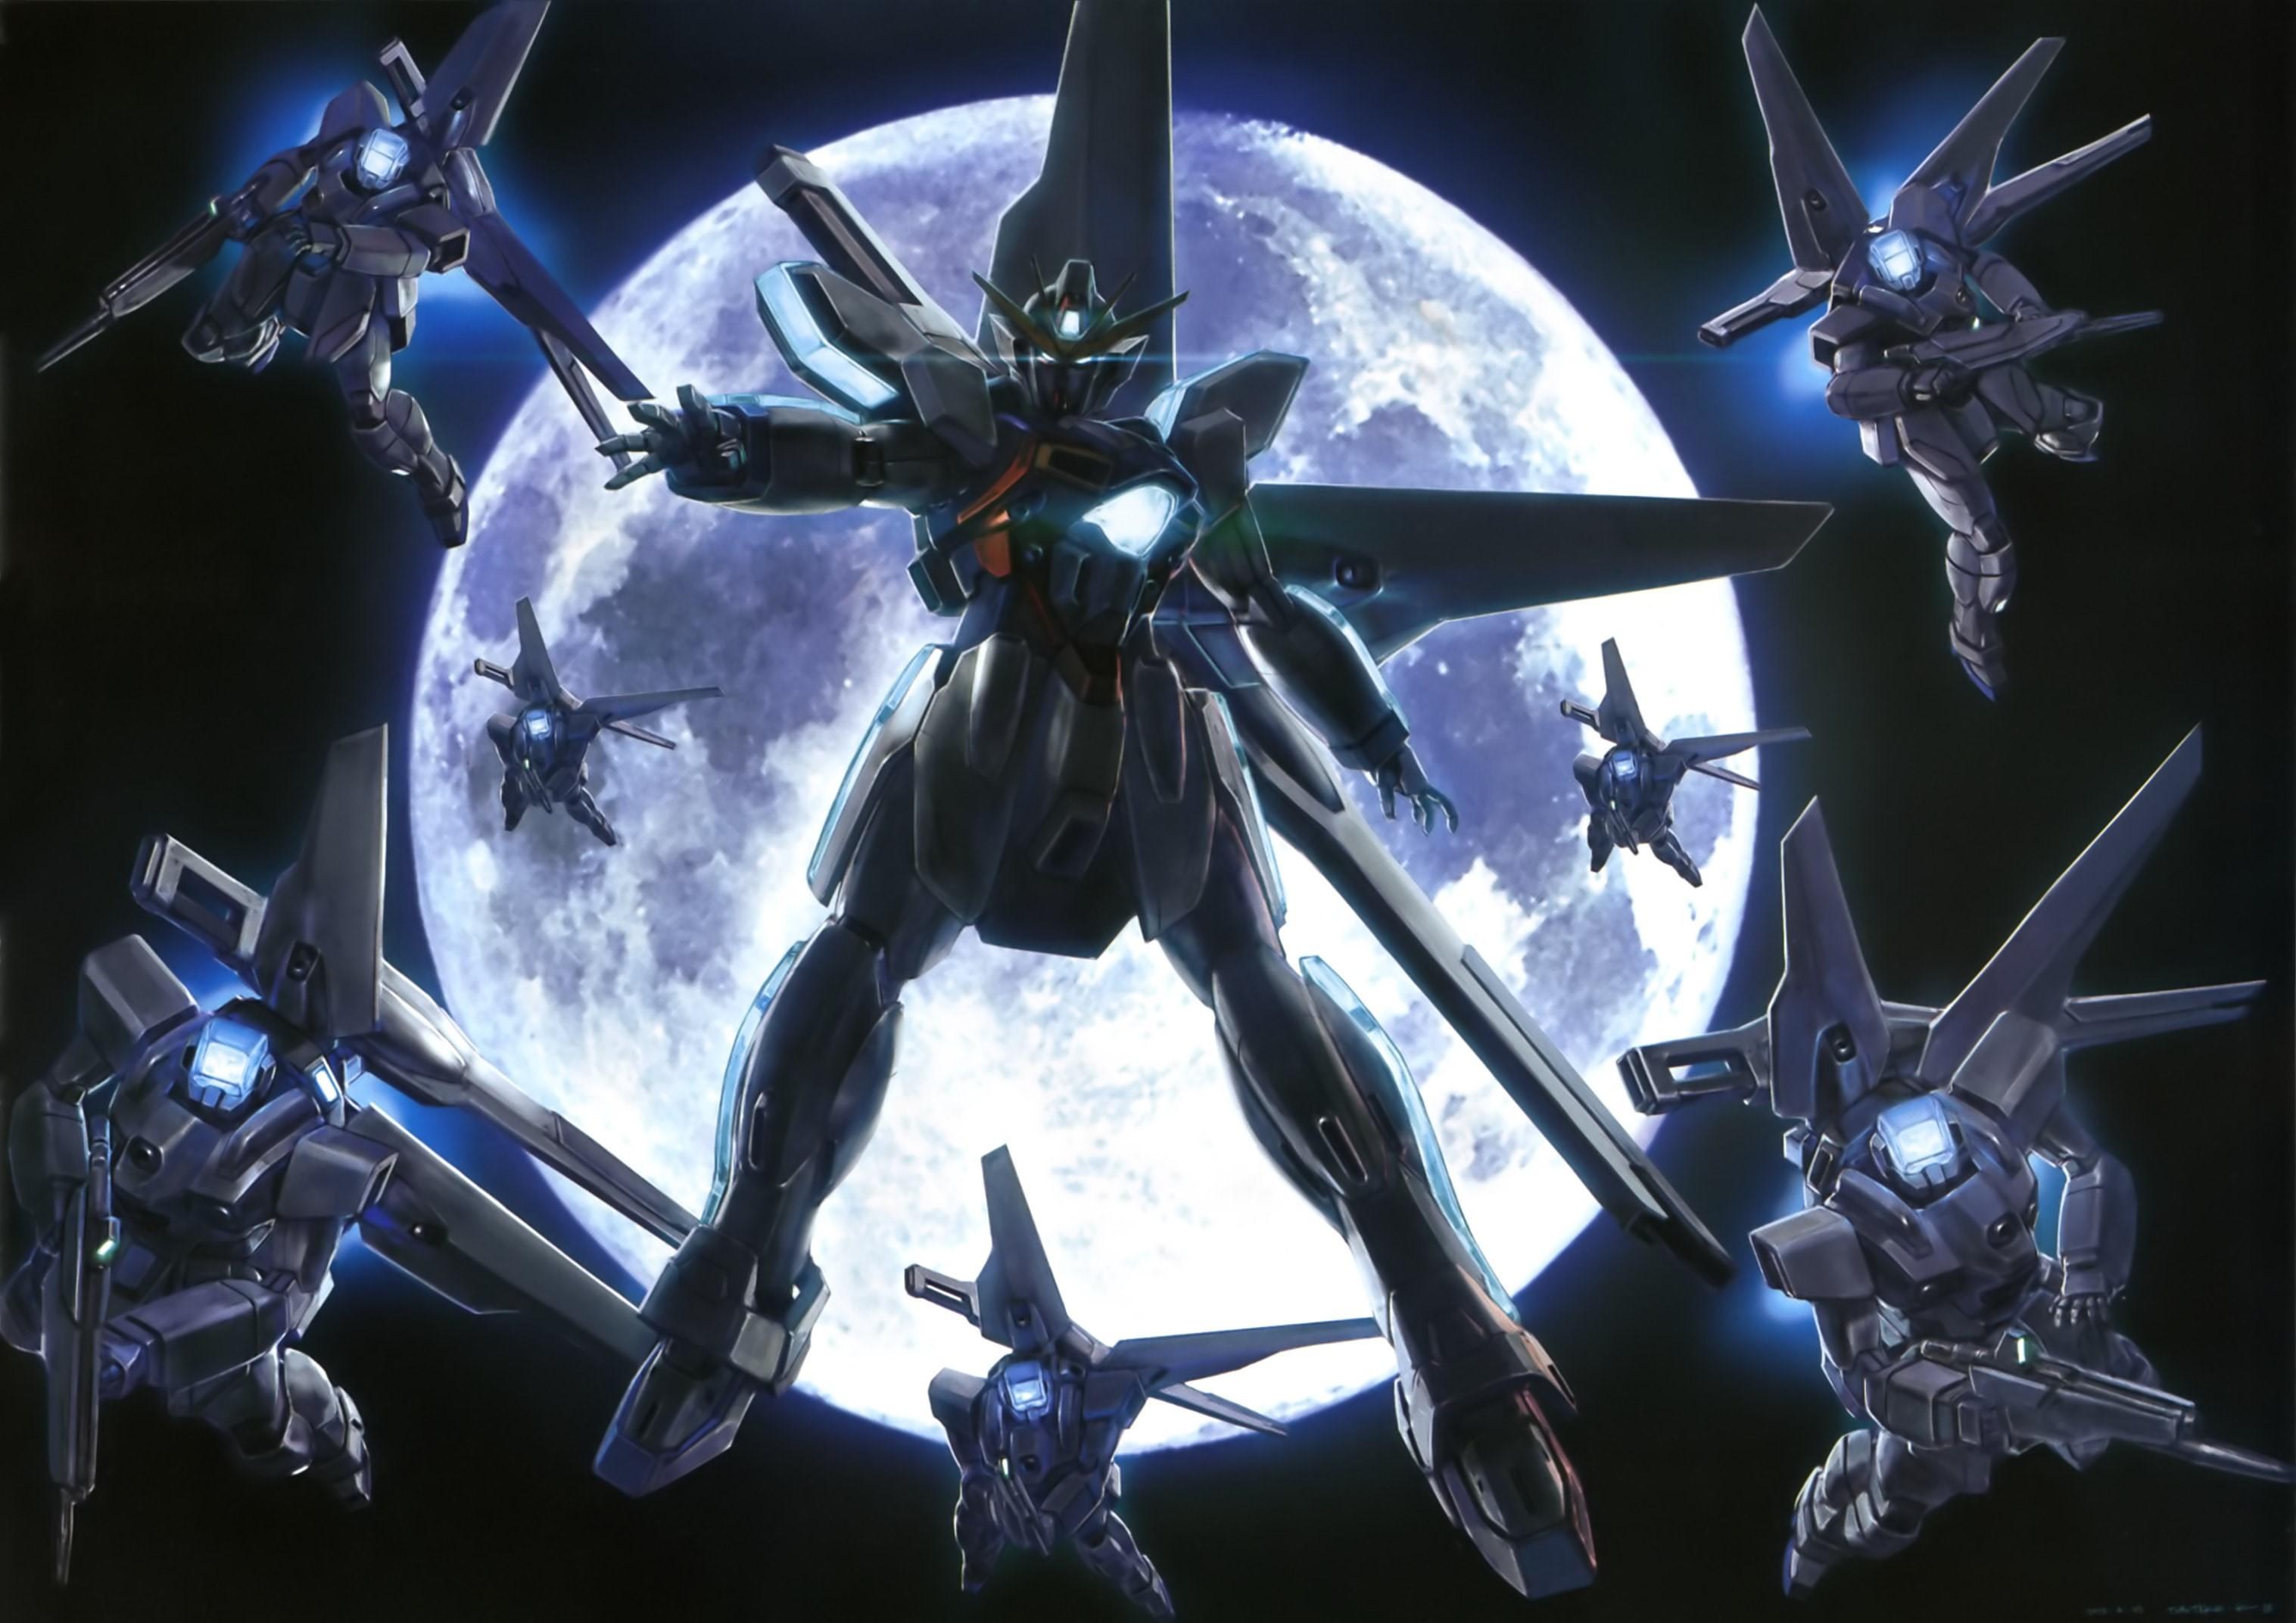 Gundam Wallpapers 1080p